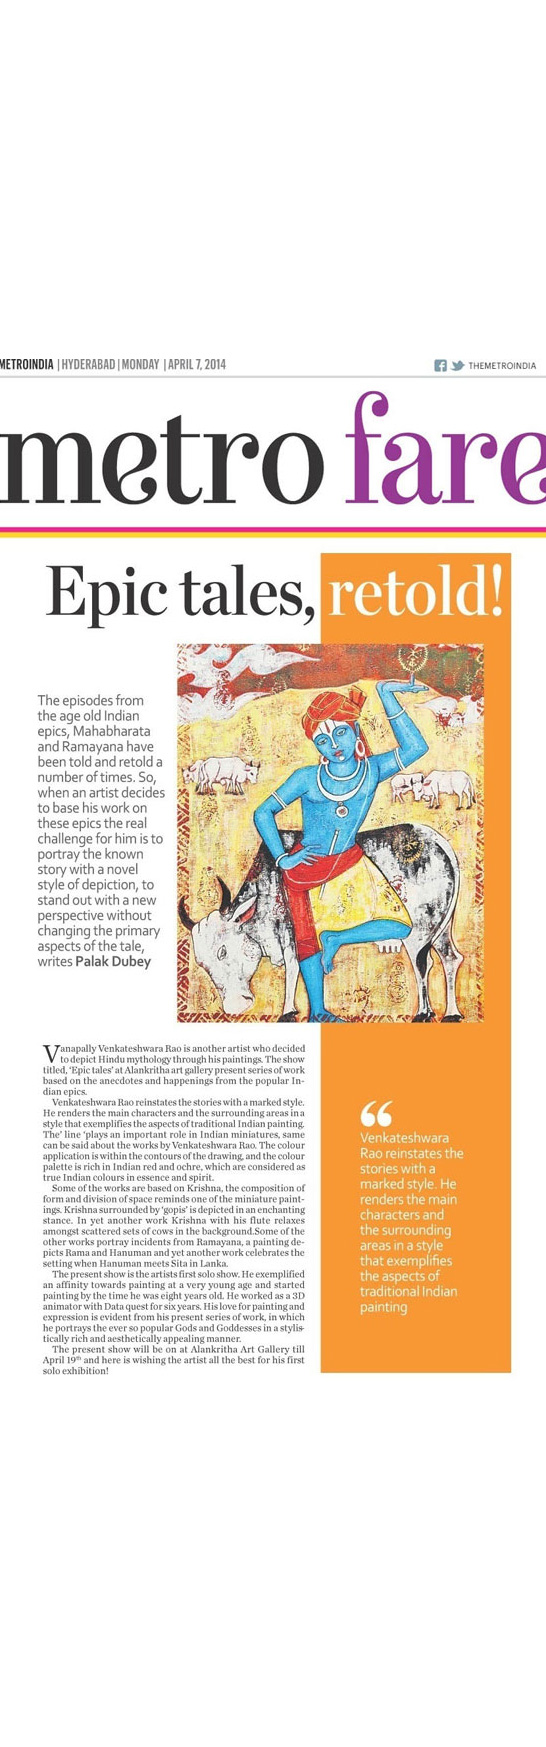 2014 Apr 7 Metro India Epic Tales